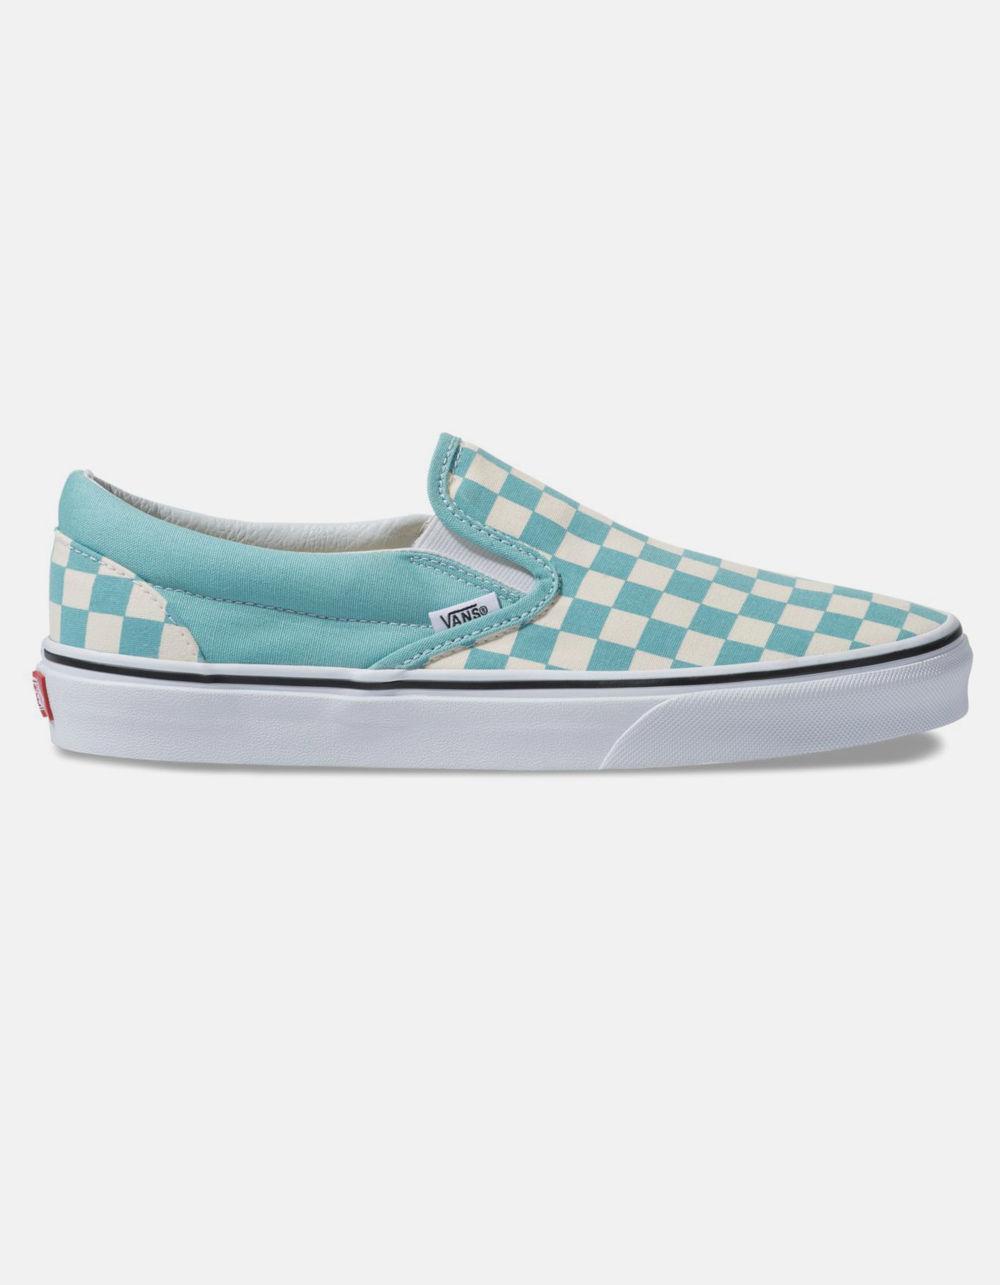 2f16910990a Vans Checkerboard Classic Slip-on Aqua Haze & True White Shoes - Lyst